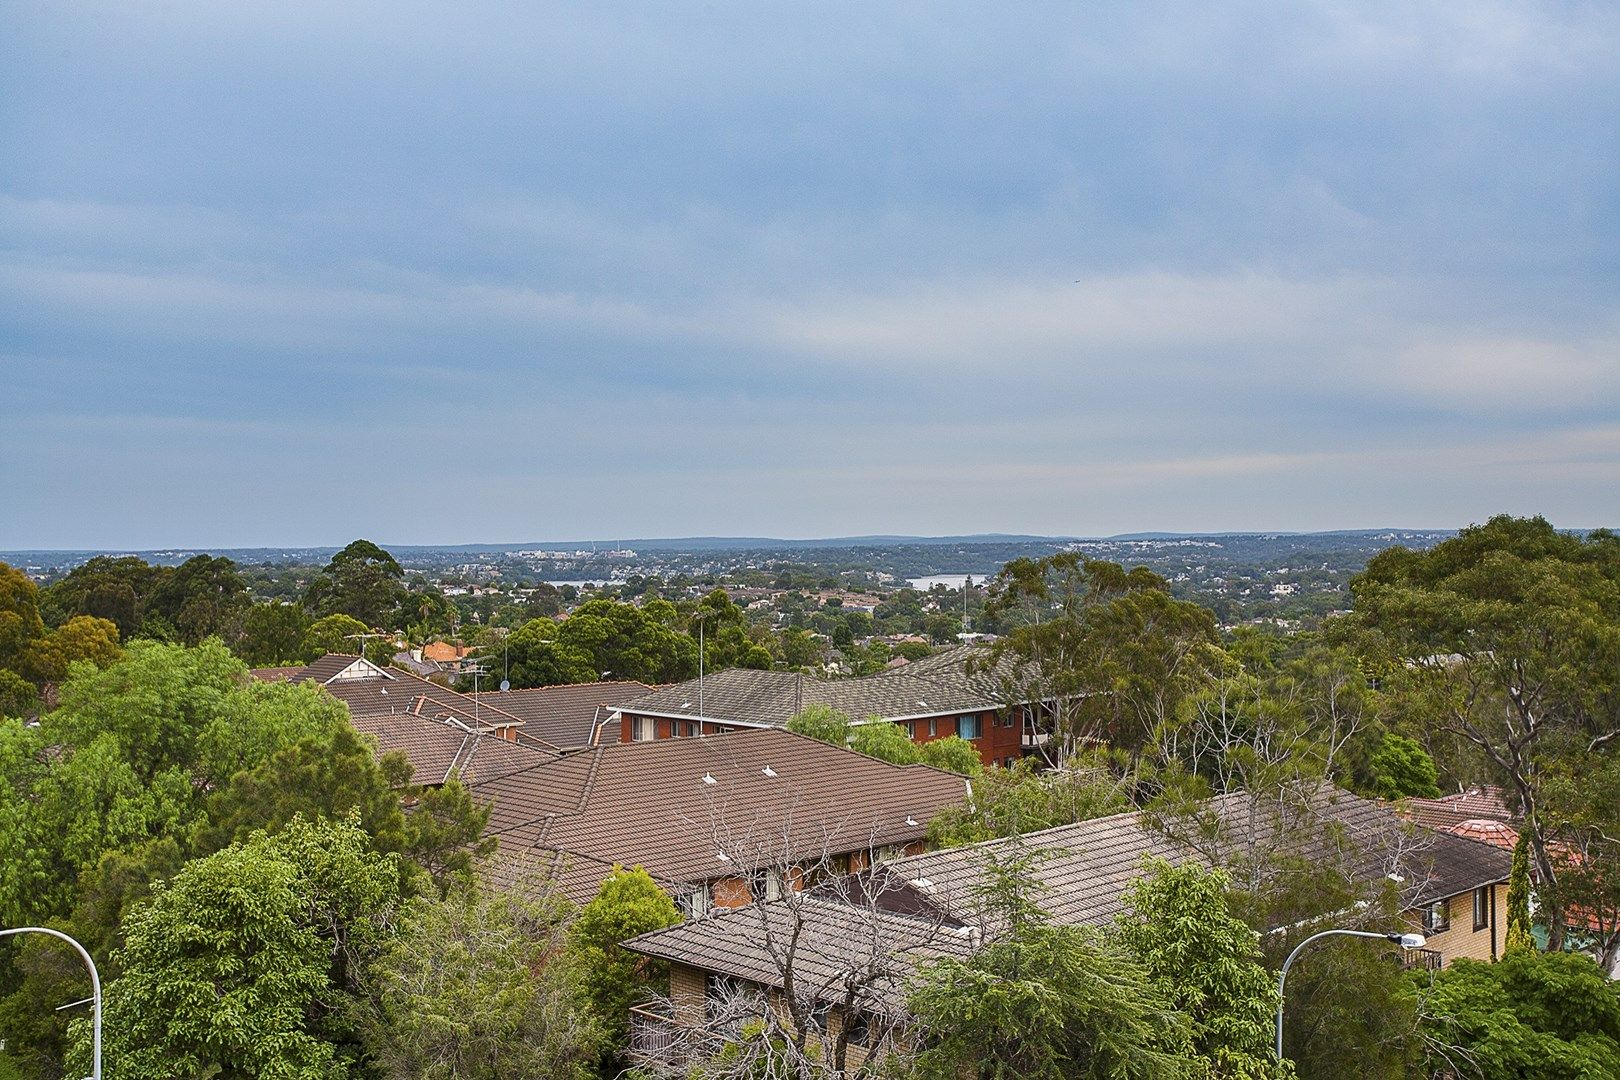 39/30-32 Woniora Road, Hurstville NSW 2220, Image 0